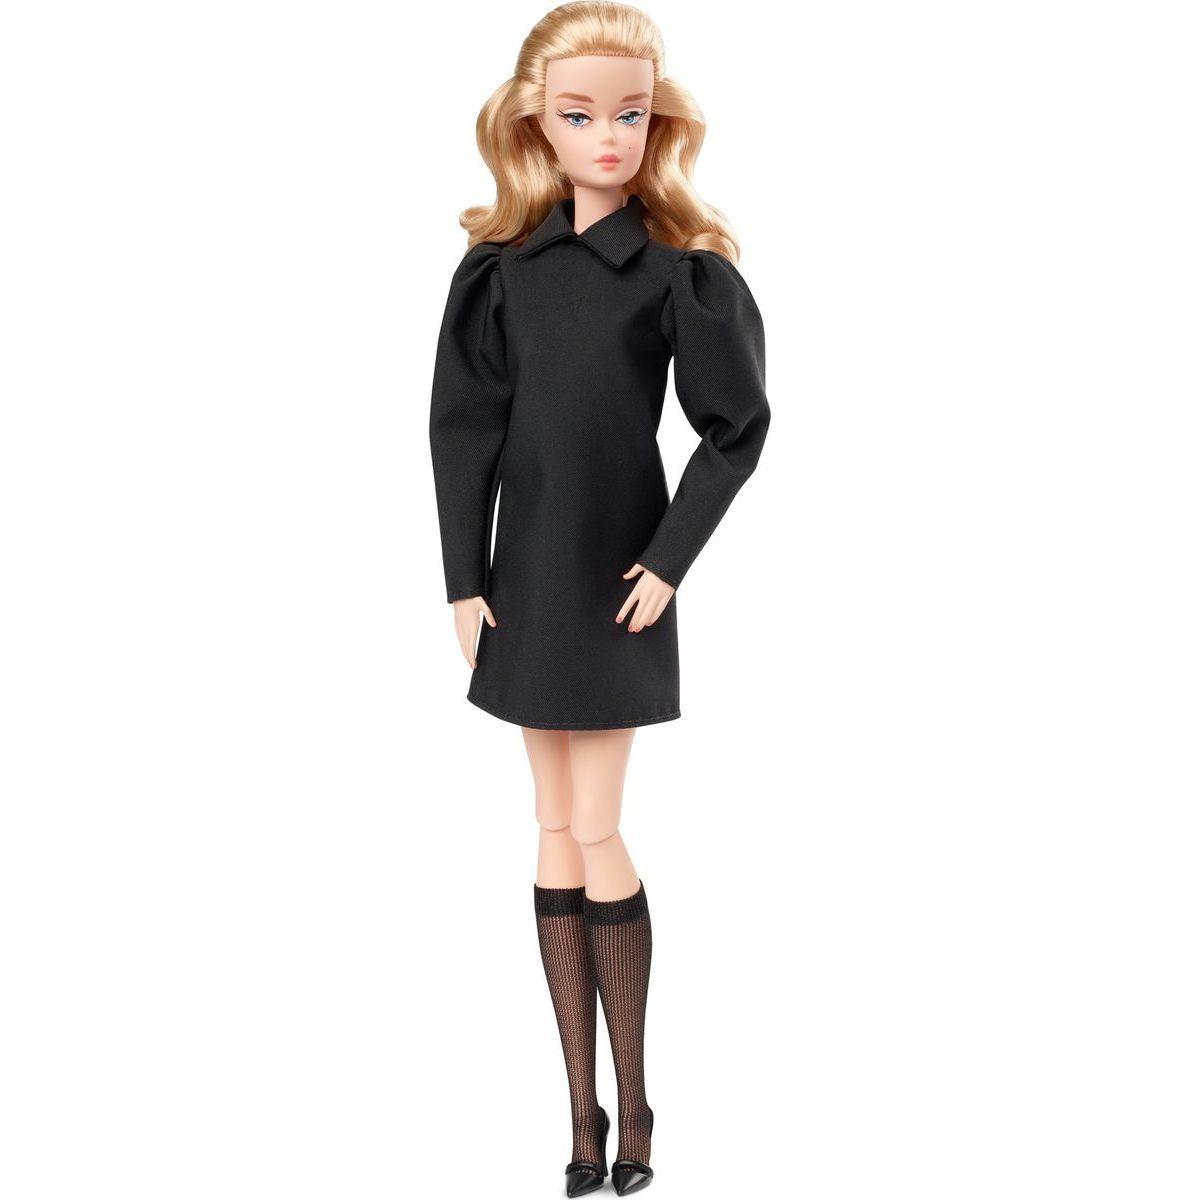 Barbie Барби коллекционная Силкстоун Лучшая в черном Barbie Best In Black Doll Mattel GHT43